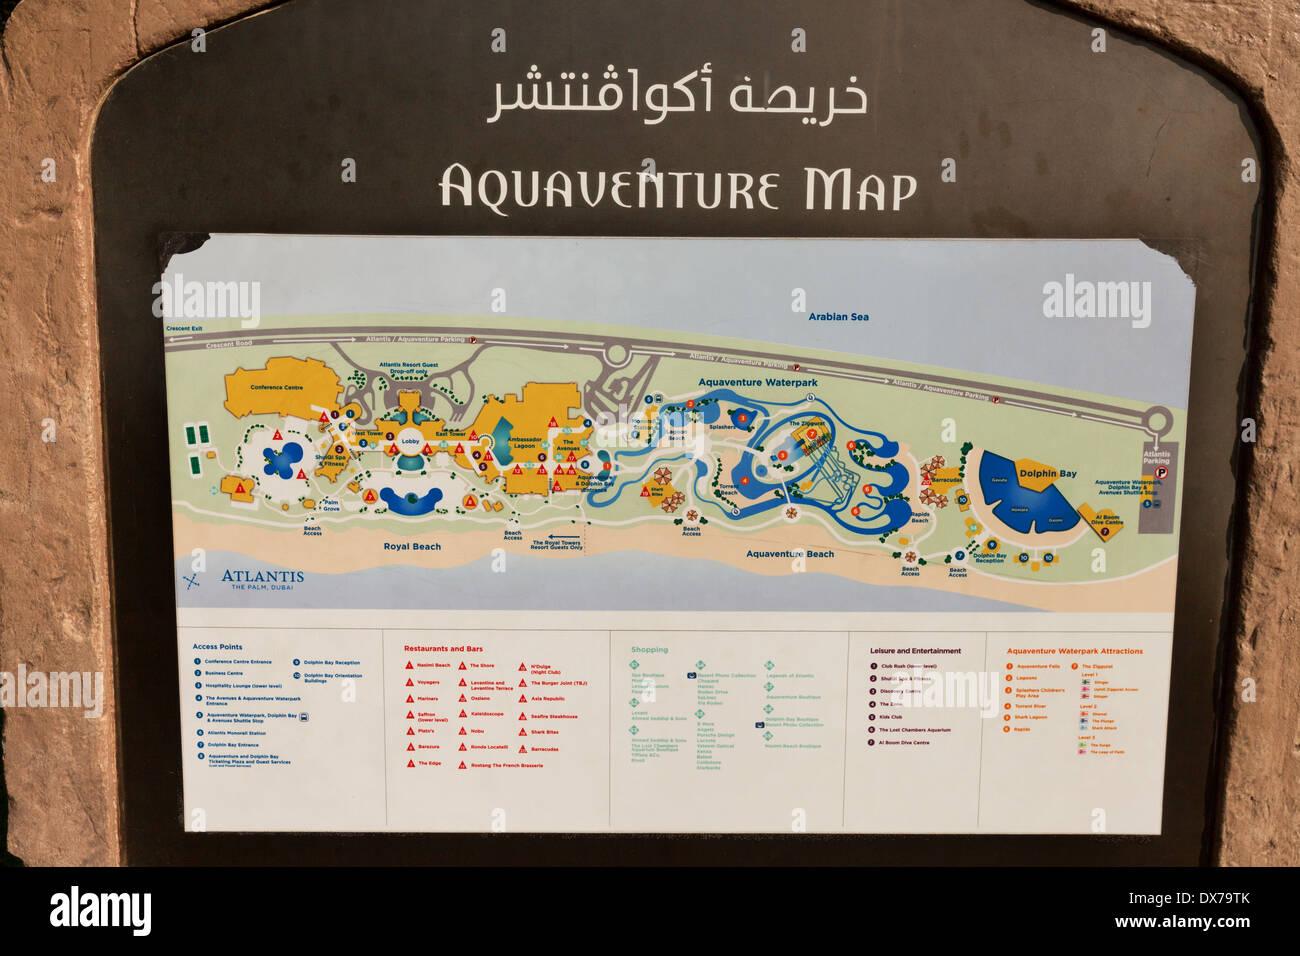 Aquaventure map atlantis hotel waterpark dubai uae united arab aquaventure map atlantis hotel waterpark dubai uae united arab emirates middle east gumiabroncs Gallery